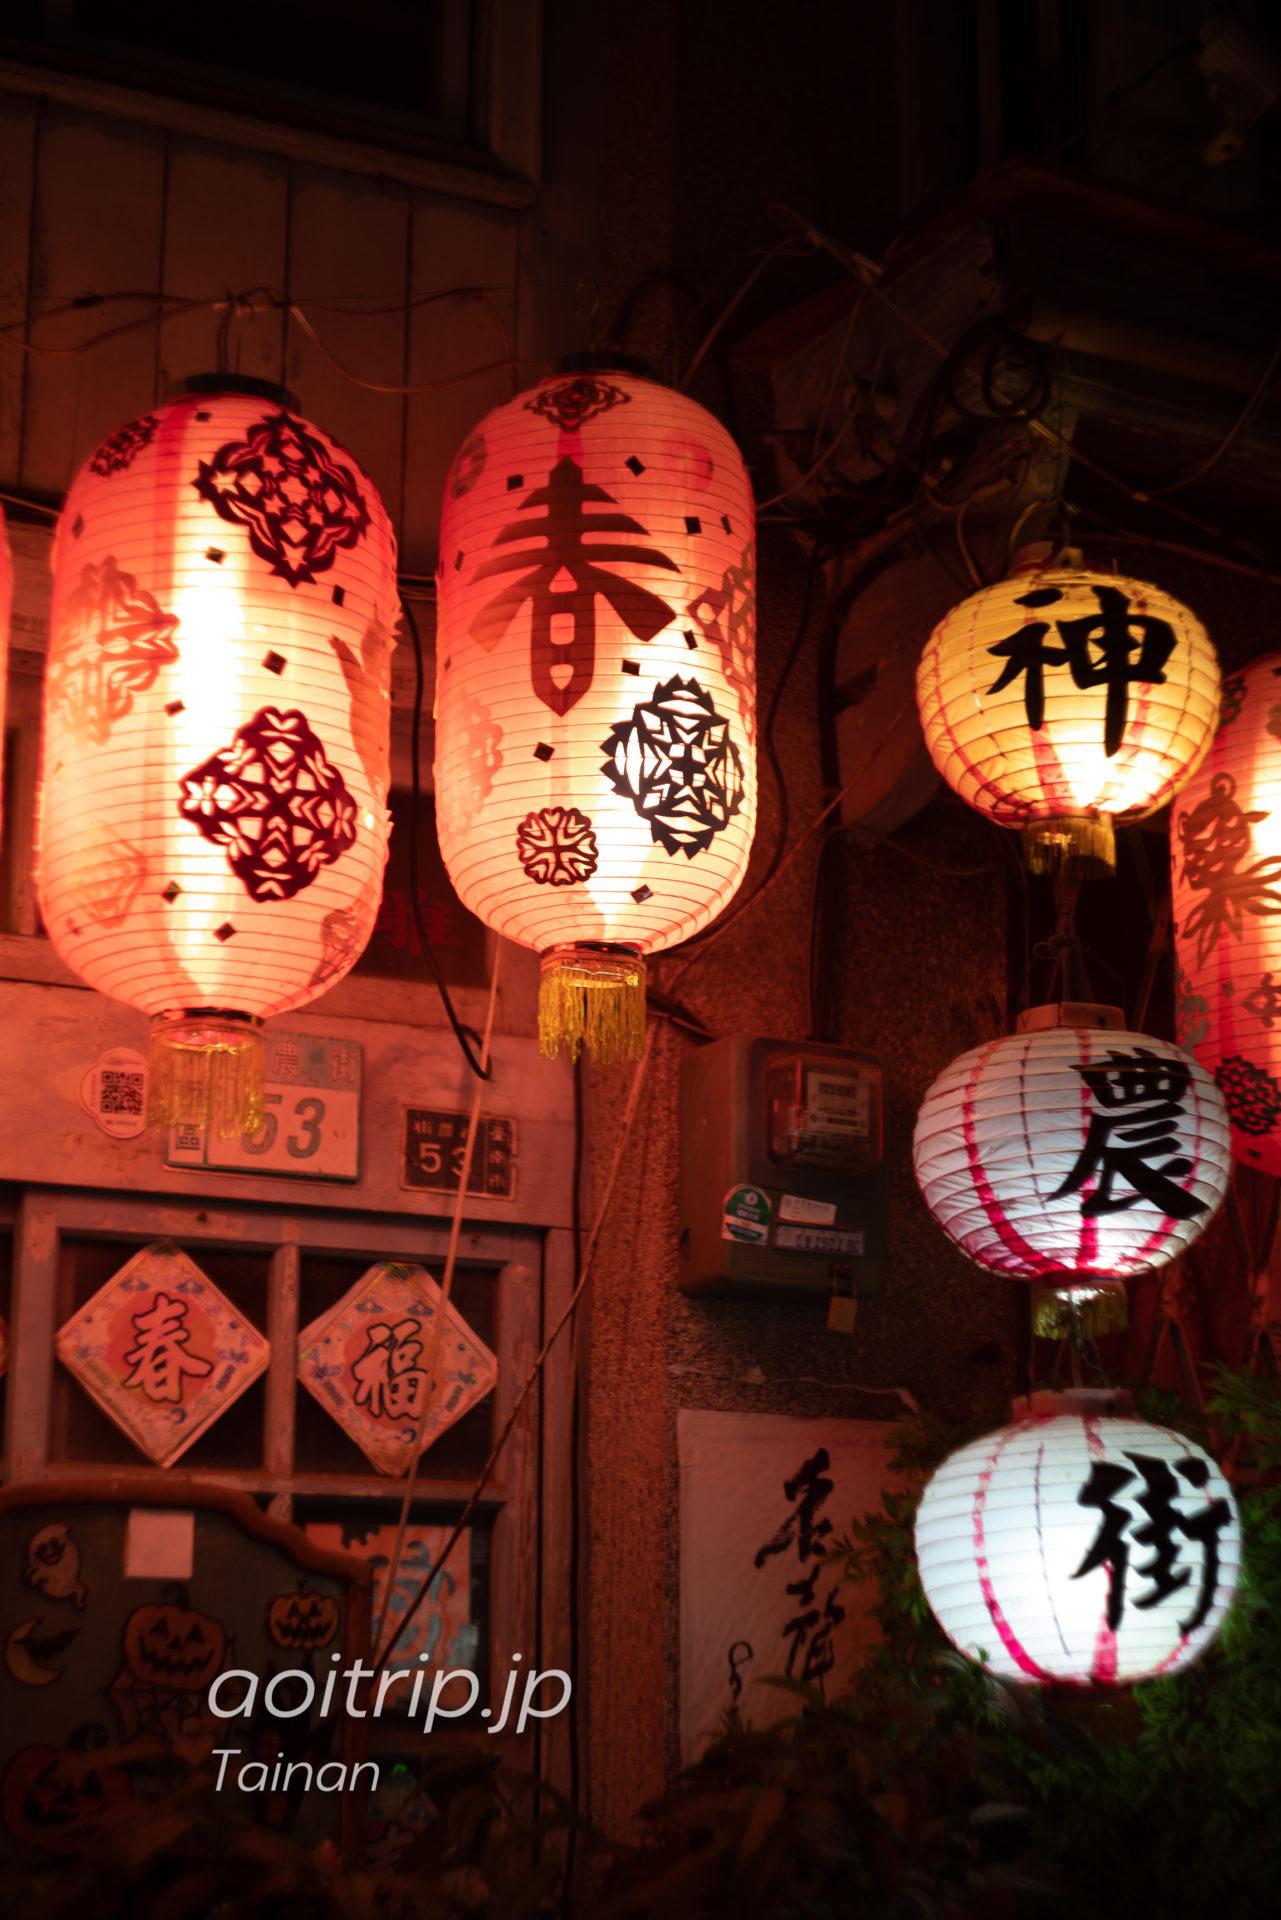 台南 夜の神農街